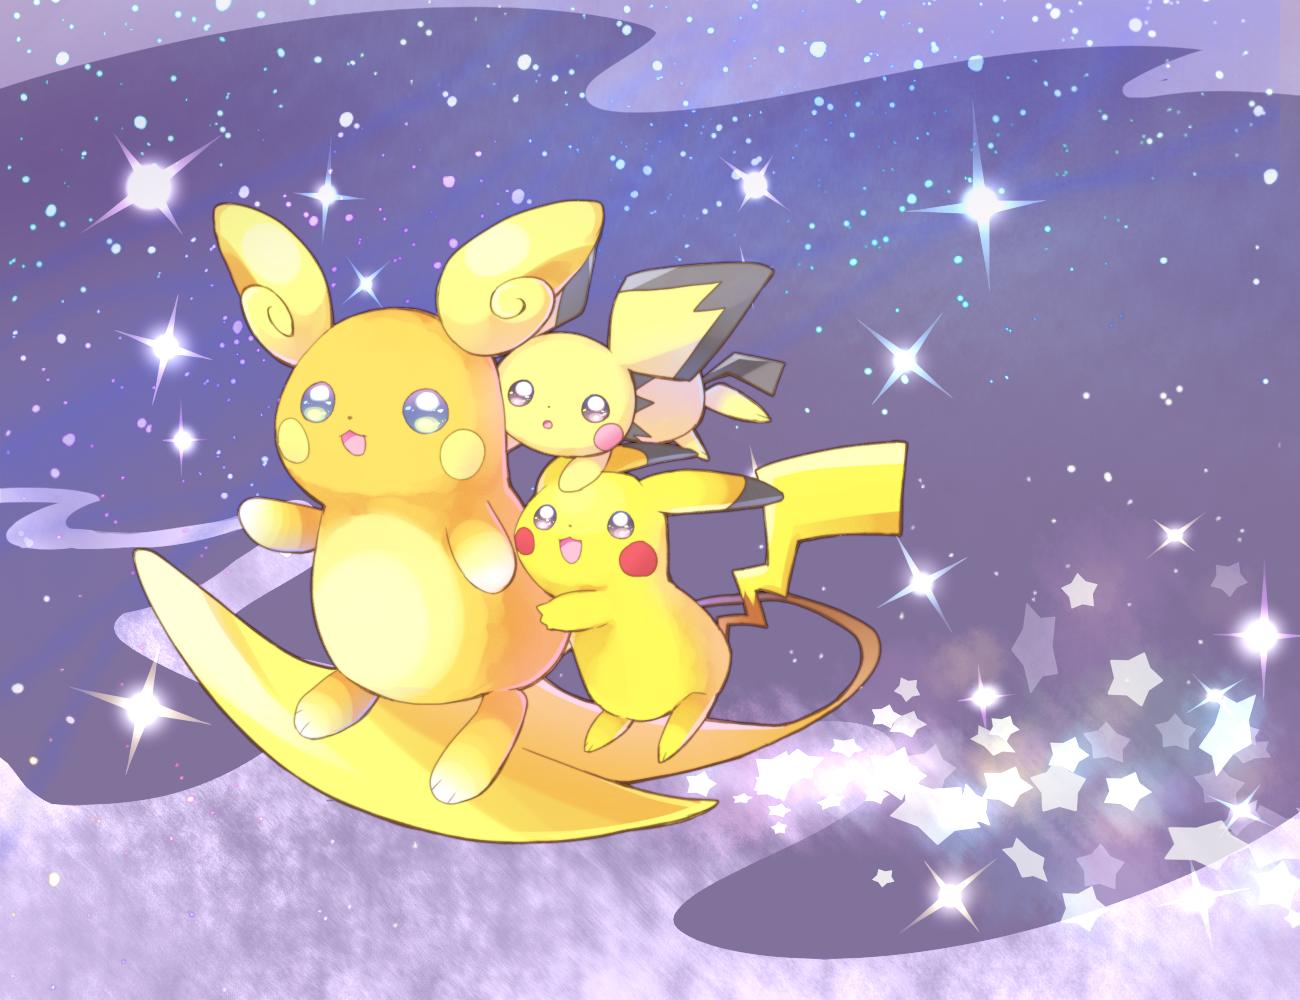 Pichu and Pikachu surfing with Alolan Raichu | Pokémon Sun ...Pichu Pikachu Raichu